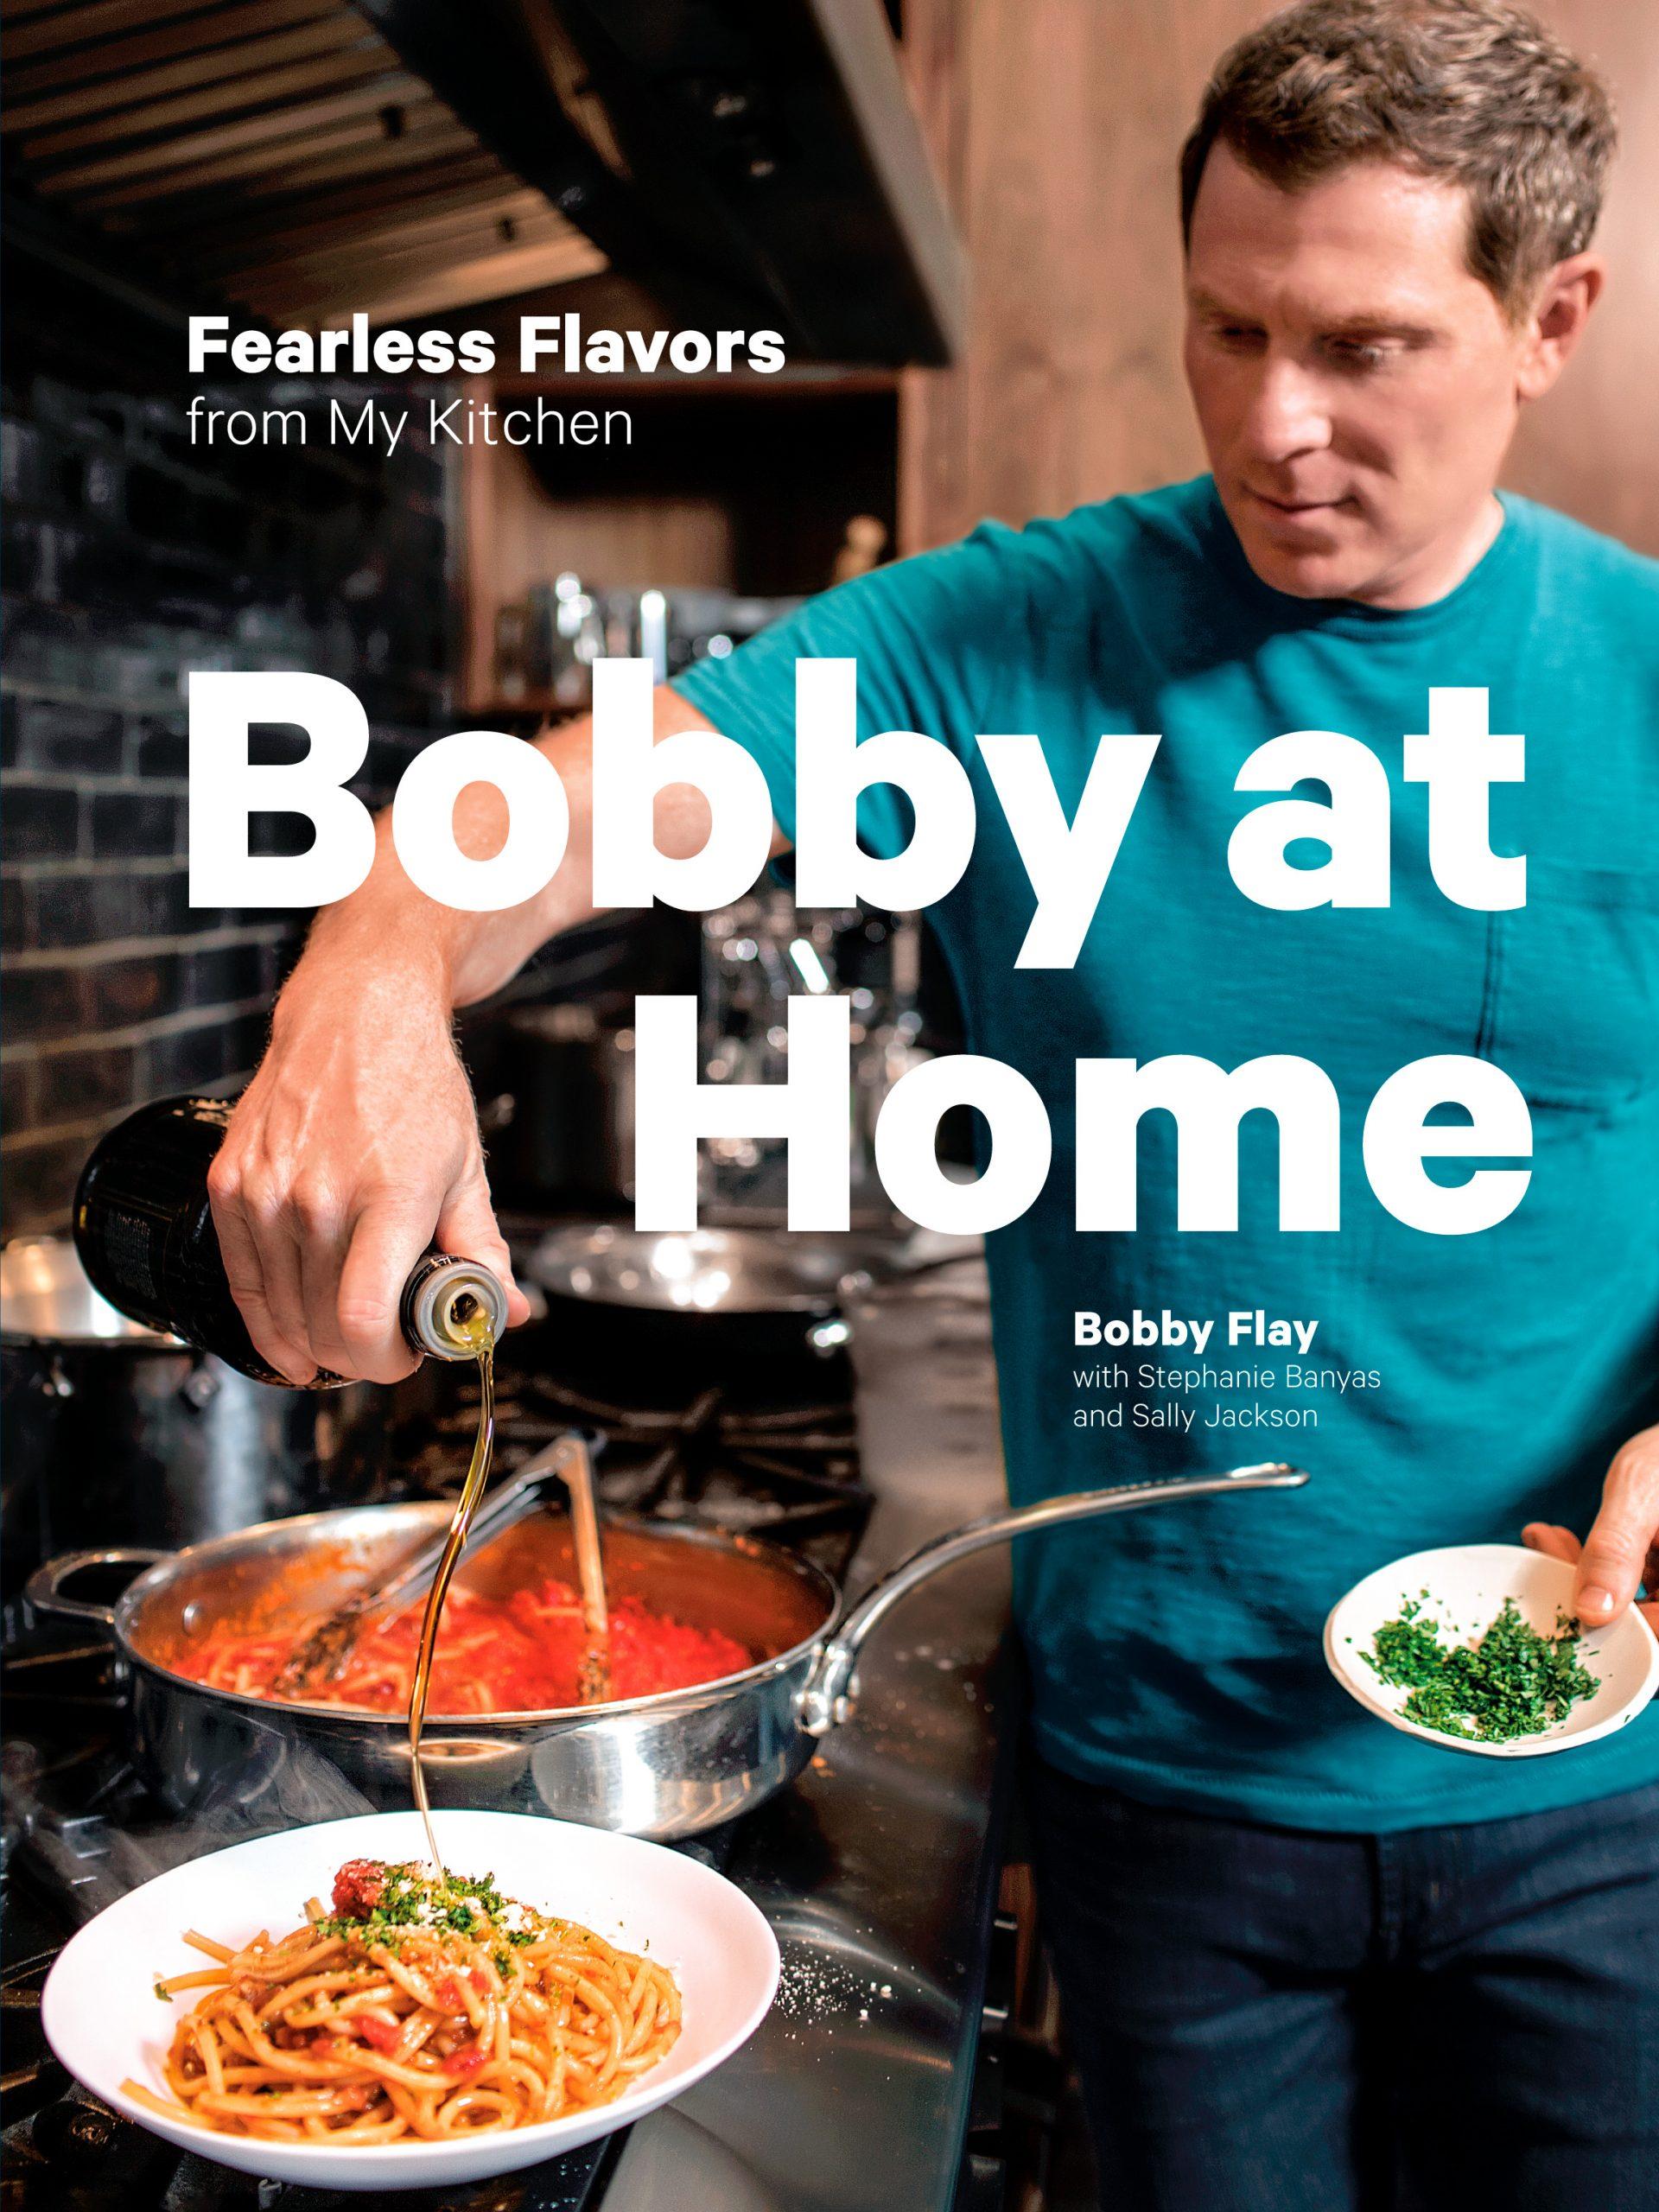 Bobby at Home by Bobby Flay